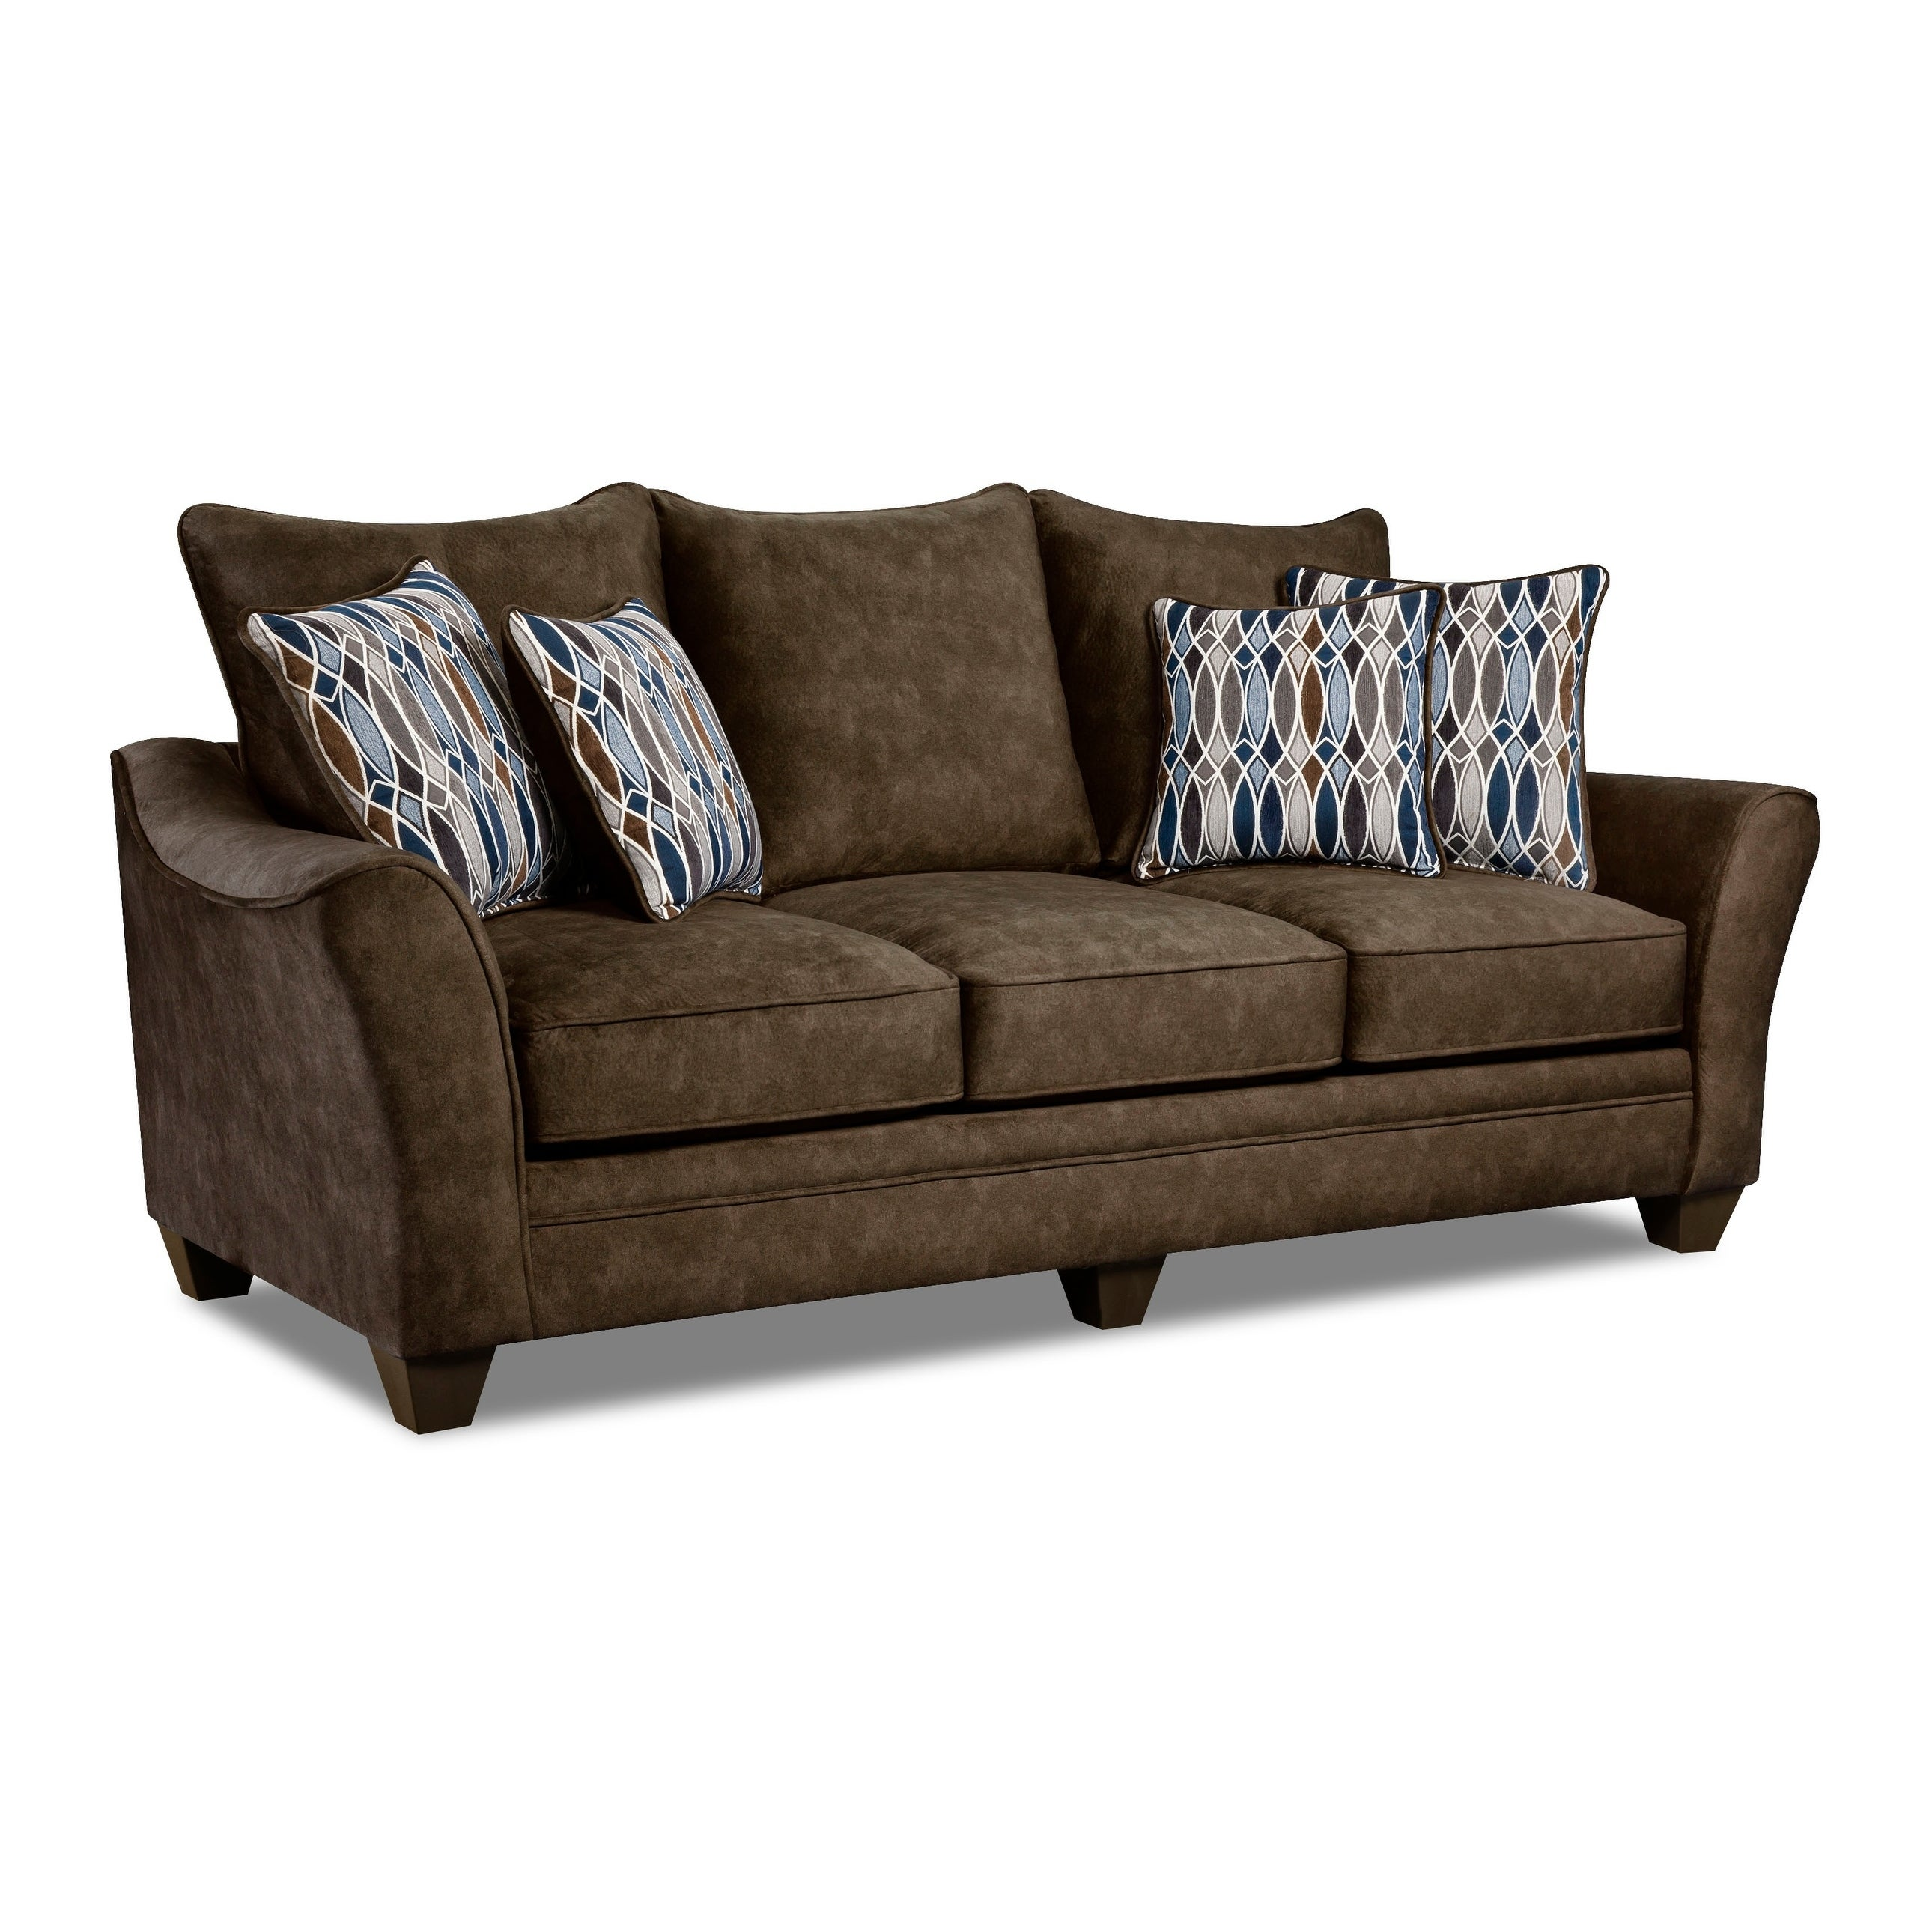 Kensington Faux Suede Sofa (Brown/ Grey/ Blue)